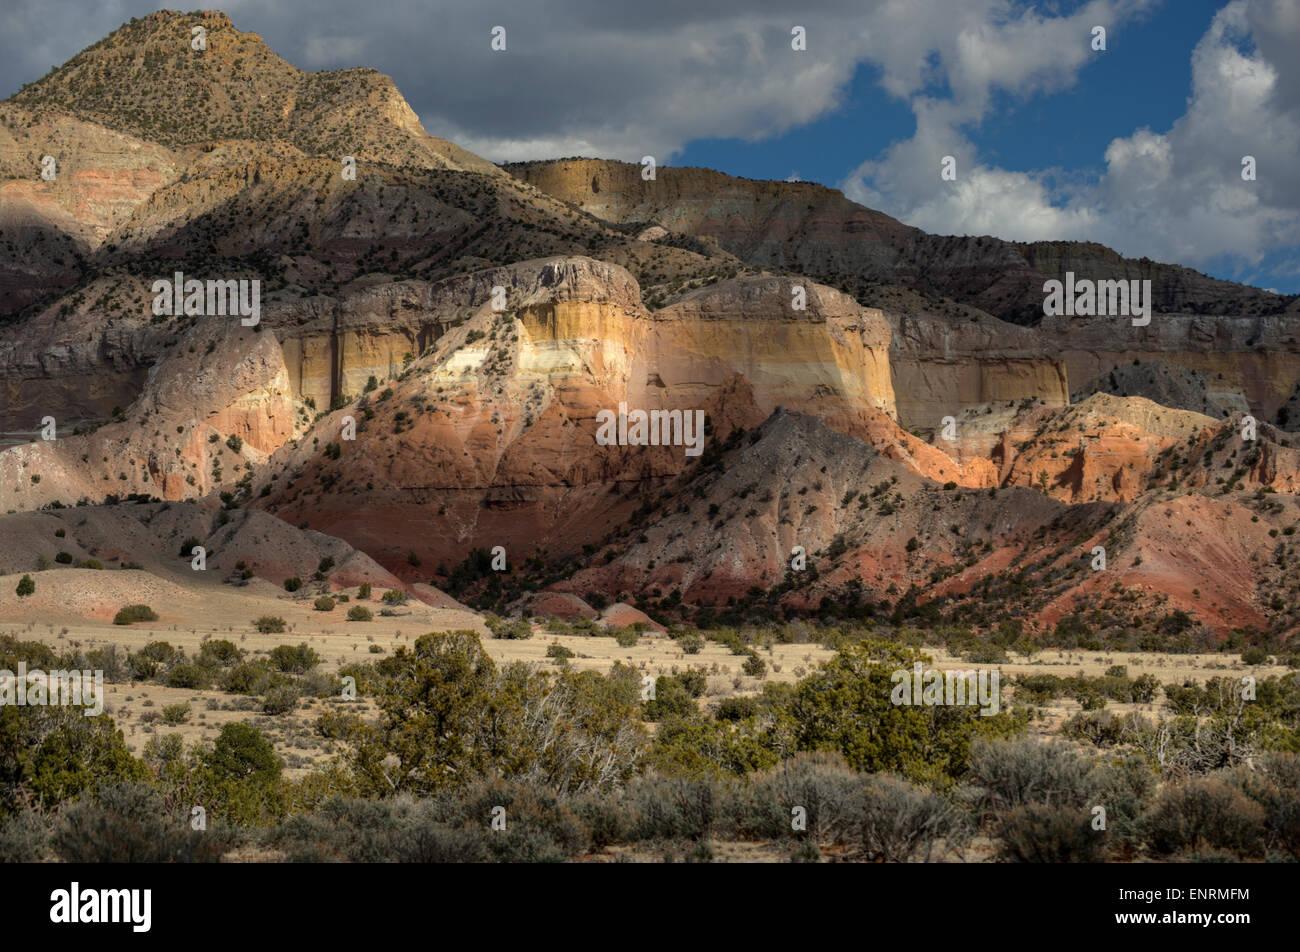 Mesozoic formations, near Abiquiu, New Mexico - Stock Image